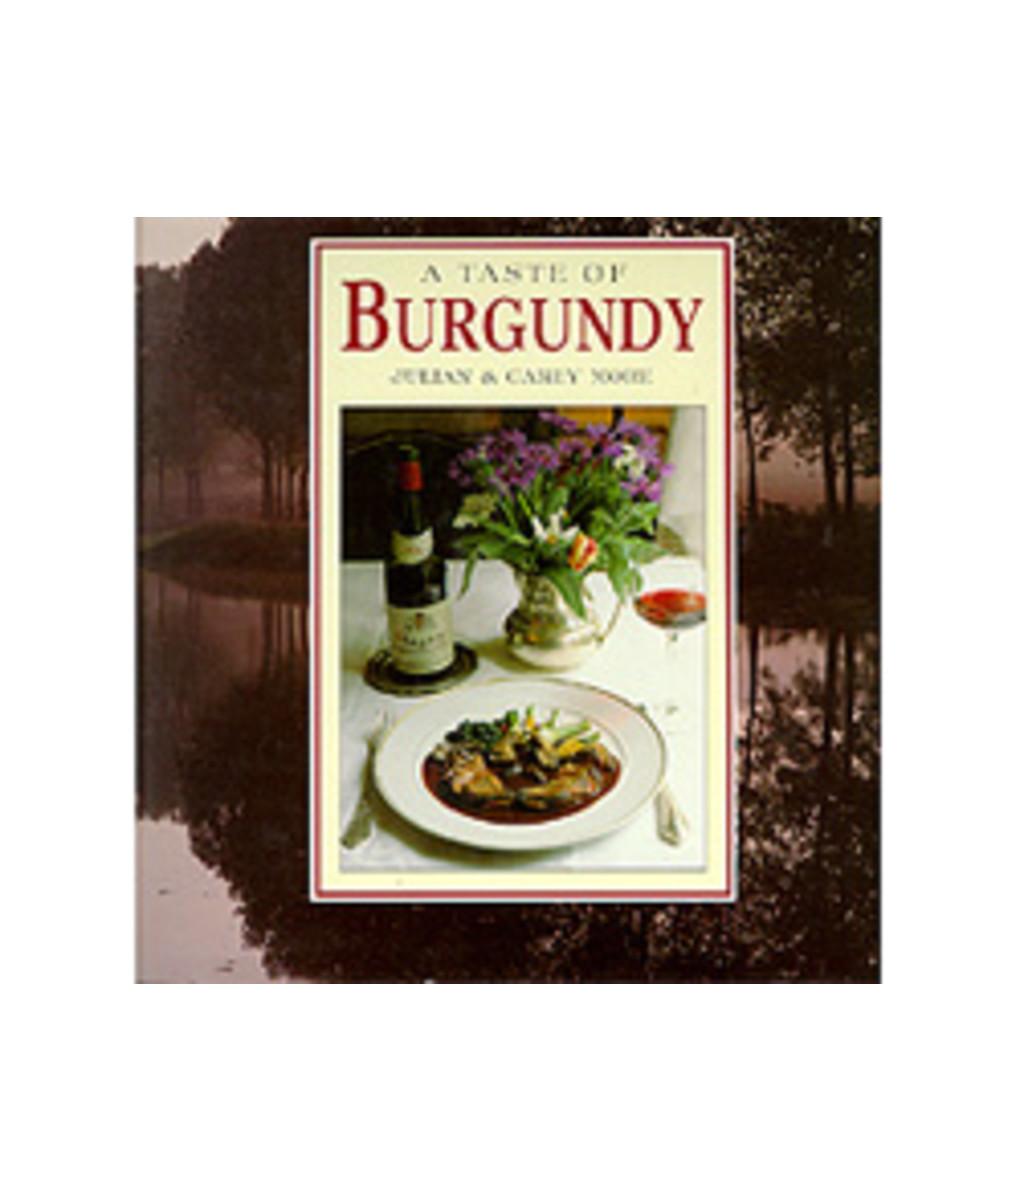 A Taste Of Burgundy